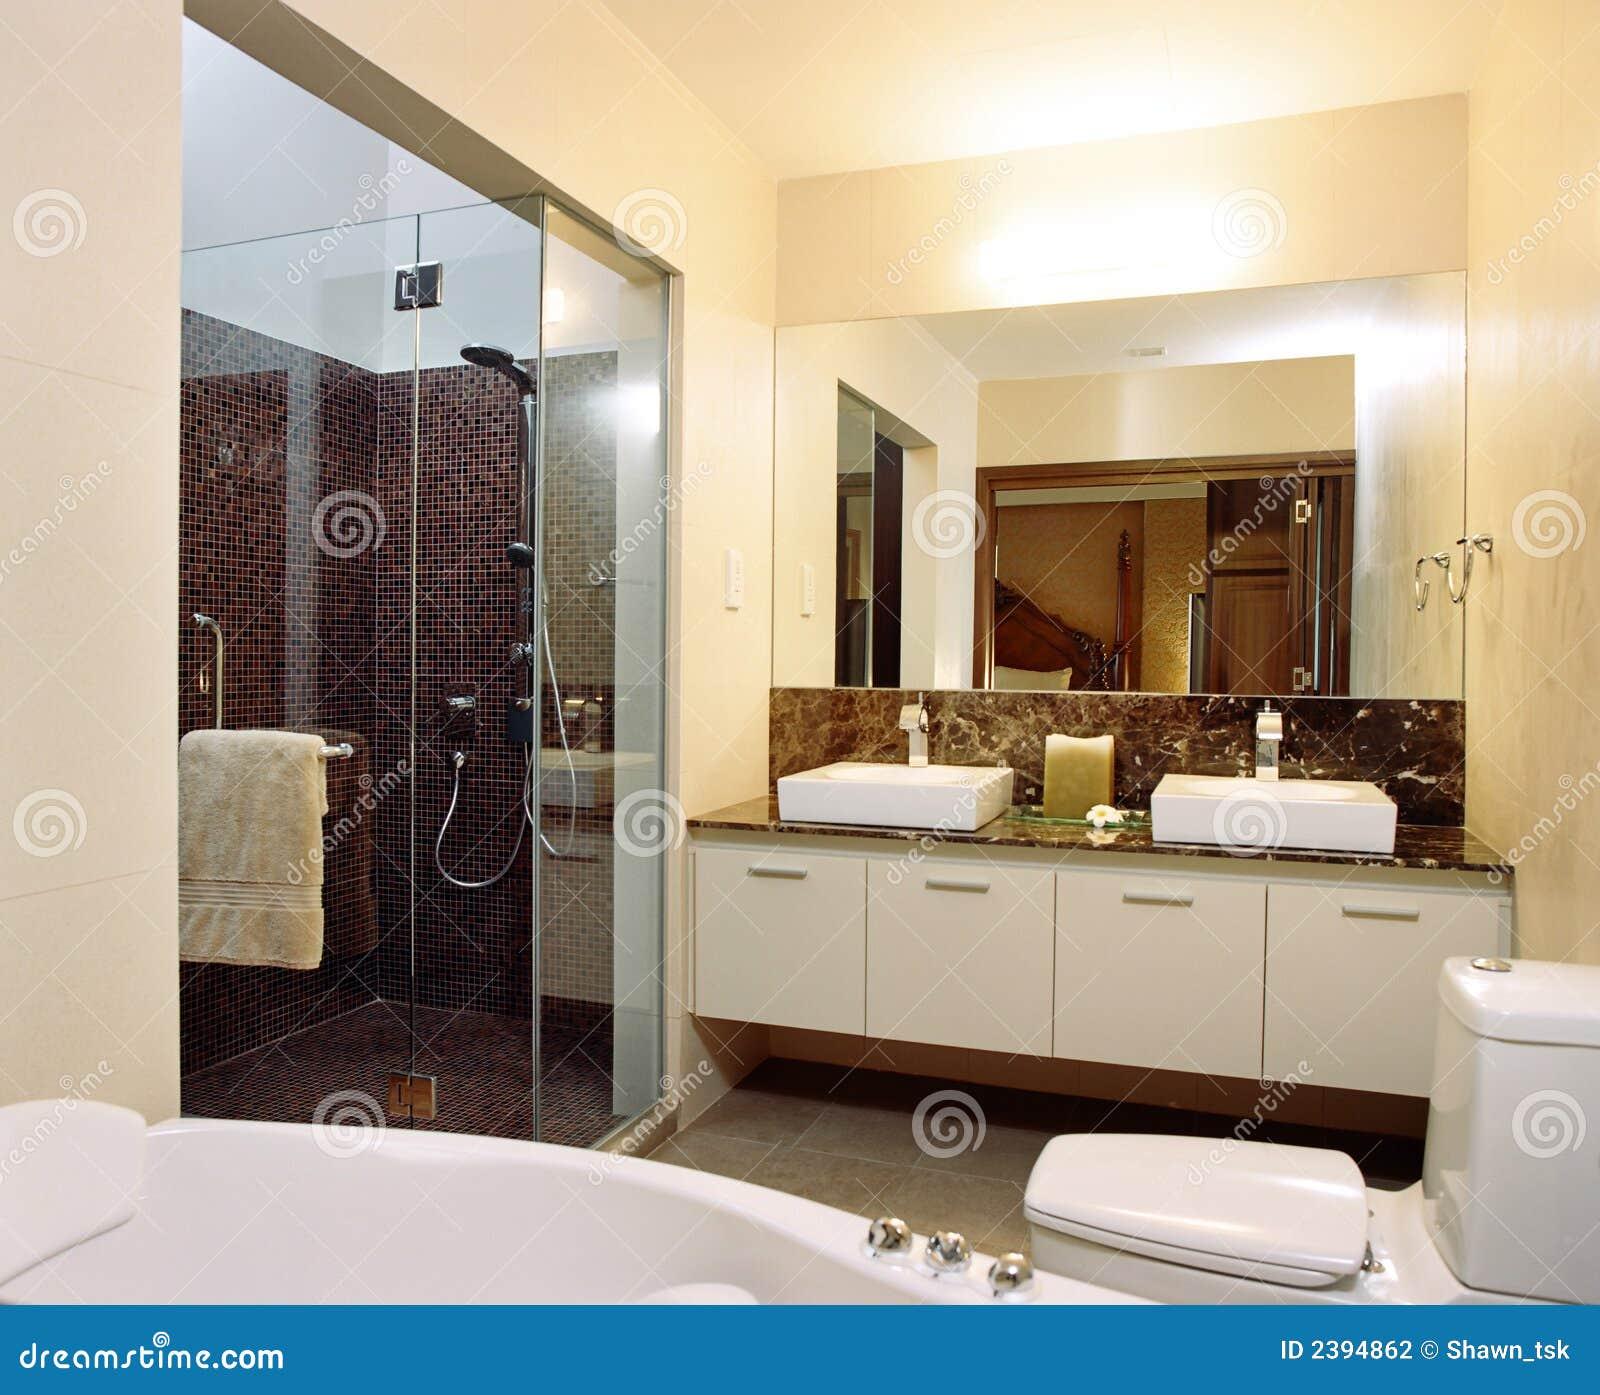 innenarchitektur badezimmer stockfoto bild 2394862. Black Bedroom Furniture Sets. Home Design Ideas